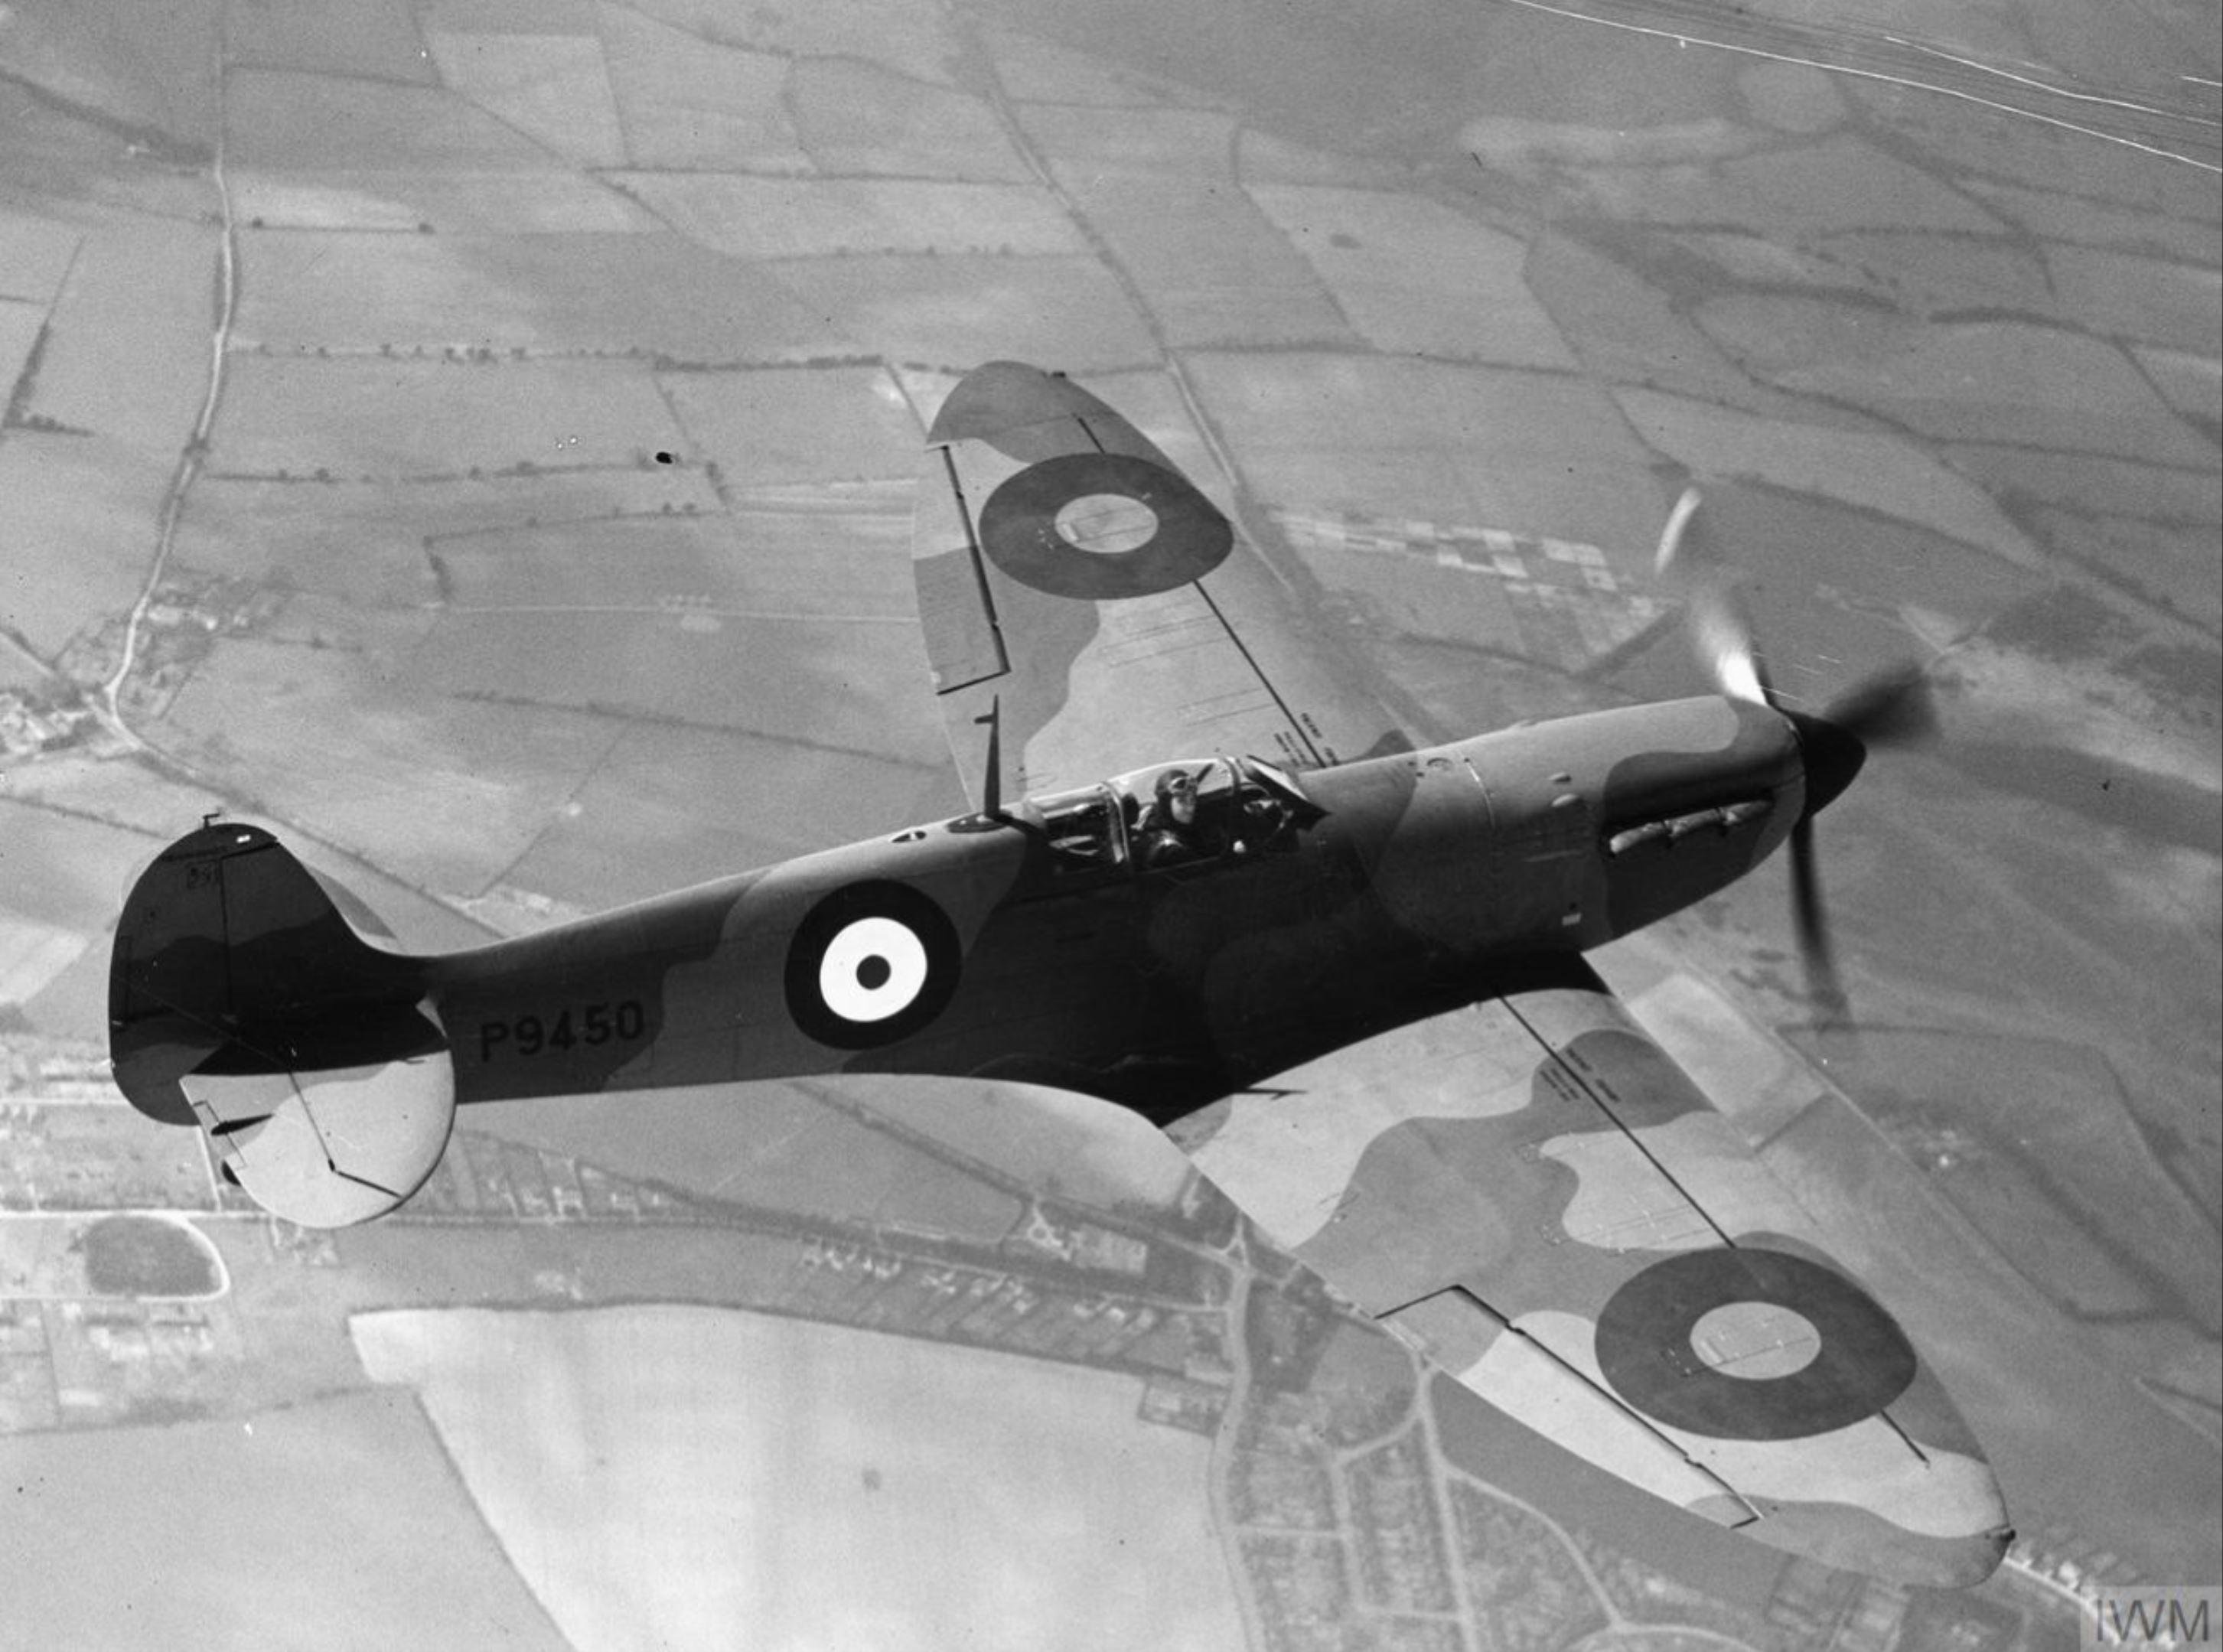 Spitfire MkI factory fresh P9450 Apr 1940 later RAF 64Sqn IWM HU103970